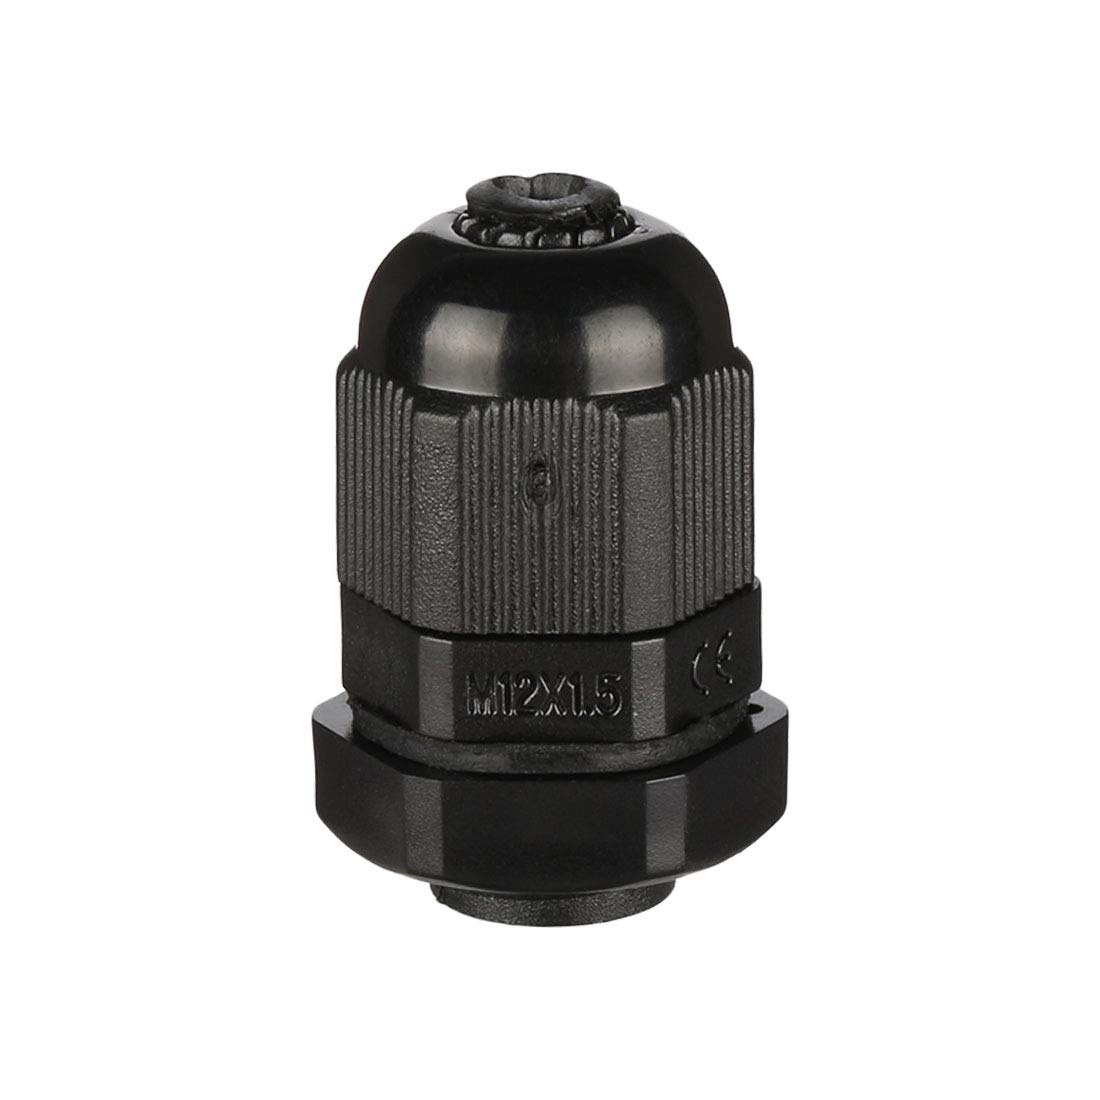 sourcingmap Junta Glándula para 3mm-6mm Diámetro Cable 20Pcs M12 ...